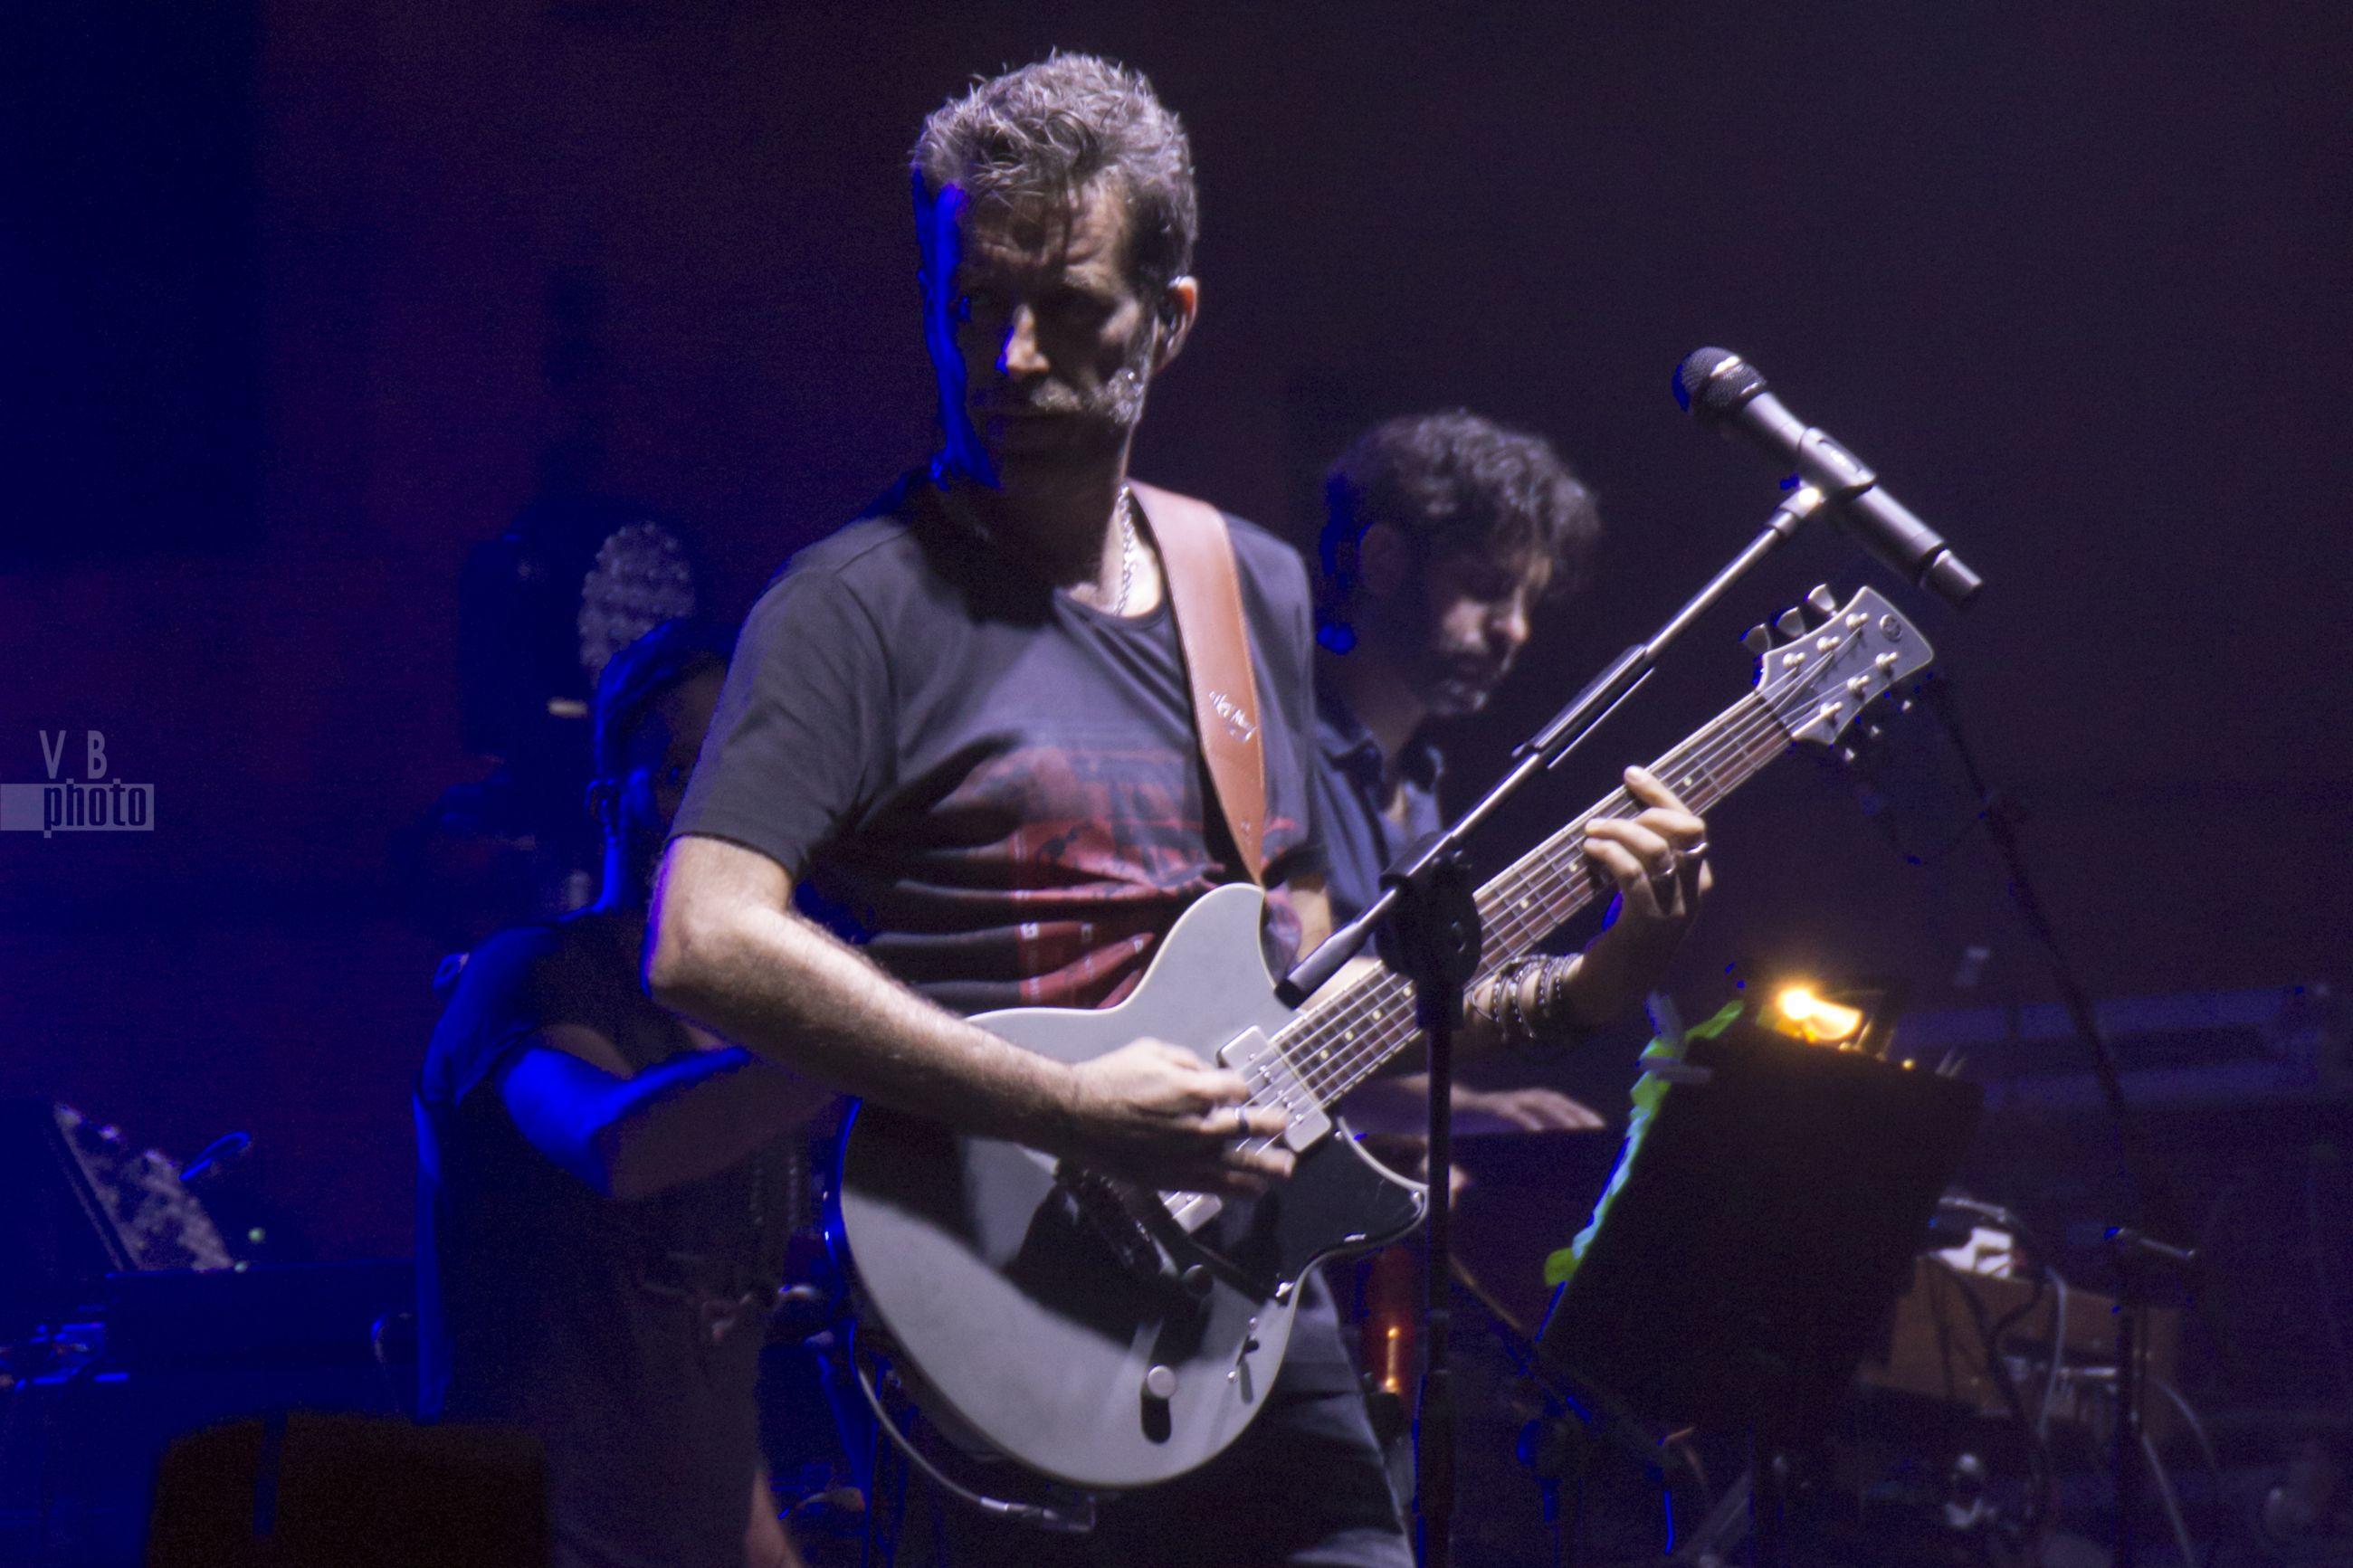 Daniele Silvestri ospite Caparezza - 19 agosto 2016